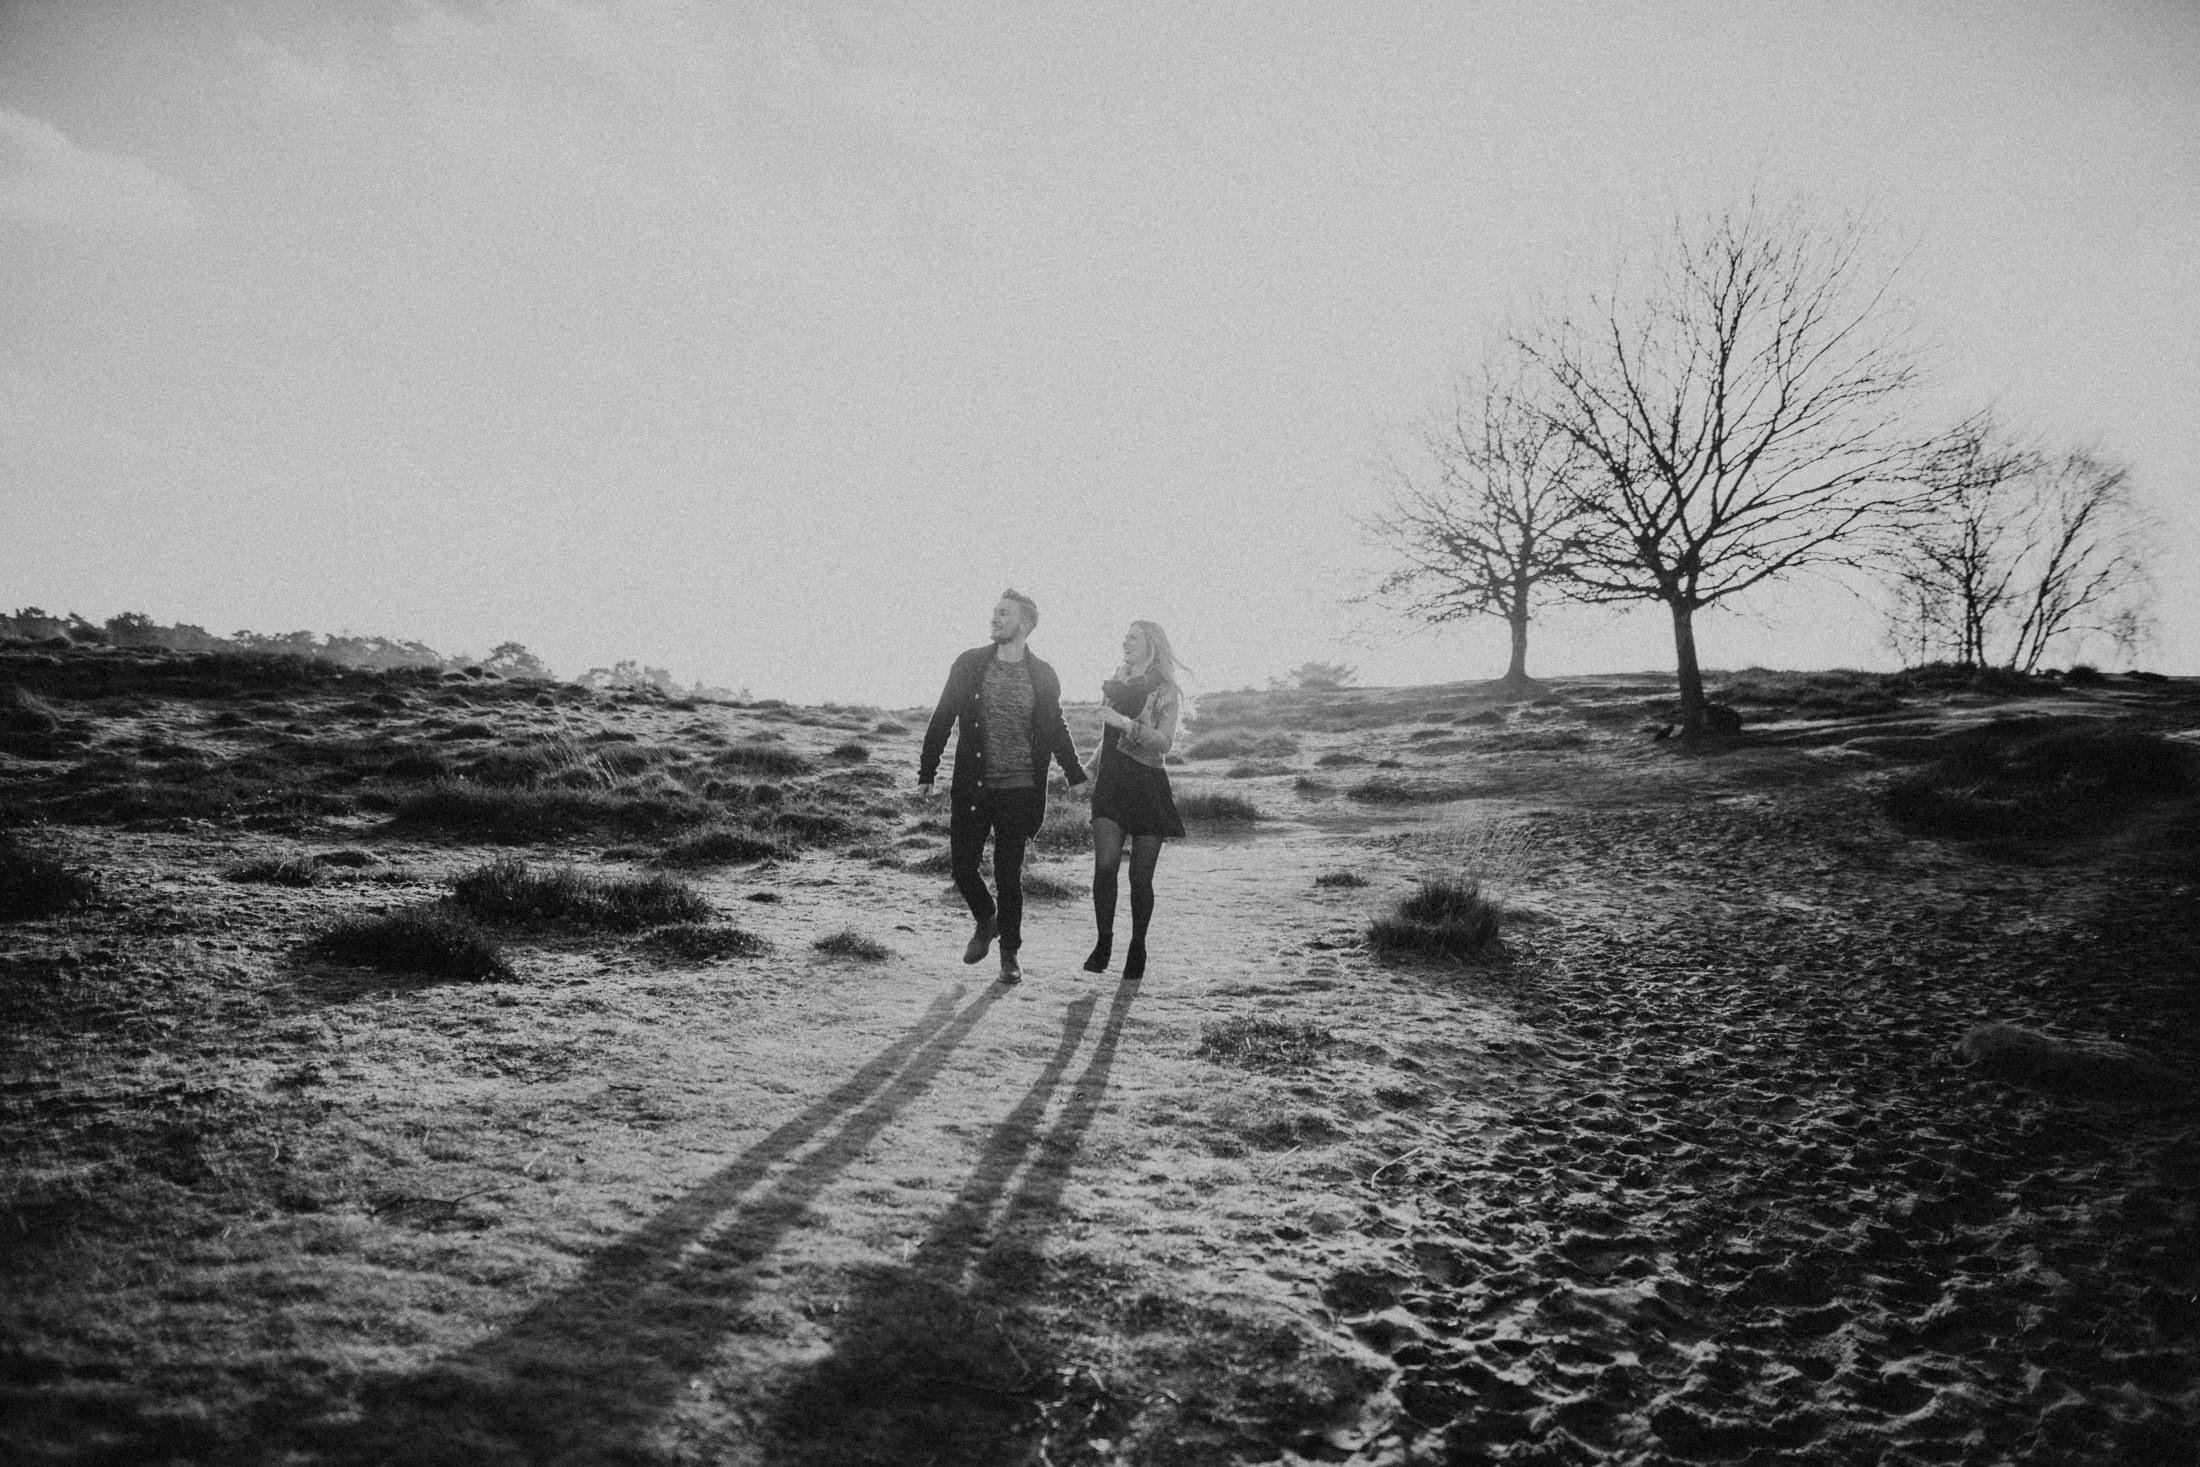 Wedding_Photographer_Mallorca_Daniela-Marquardt_Photography_CanaryIslands_Lanzarote_Iceland_Tuskany_Santorini_Portugal__Austria_Elopement_Hochzeitsfotograf_Milena_Marvin_14